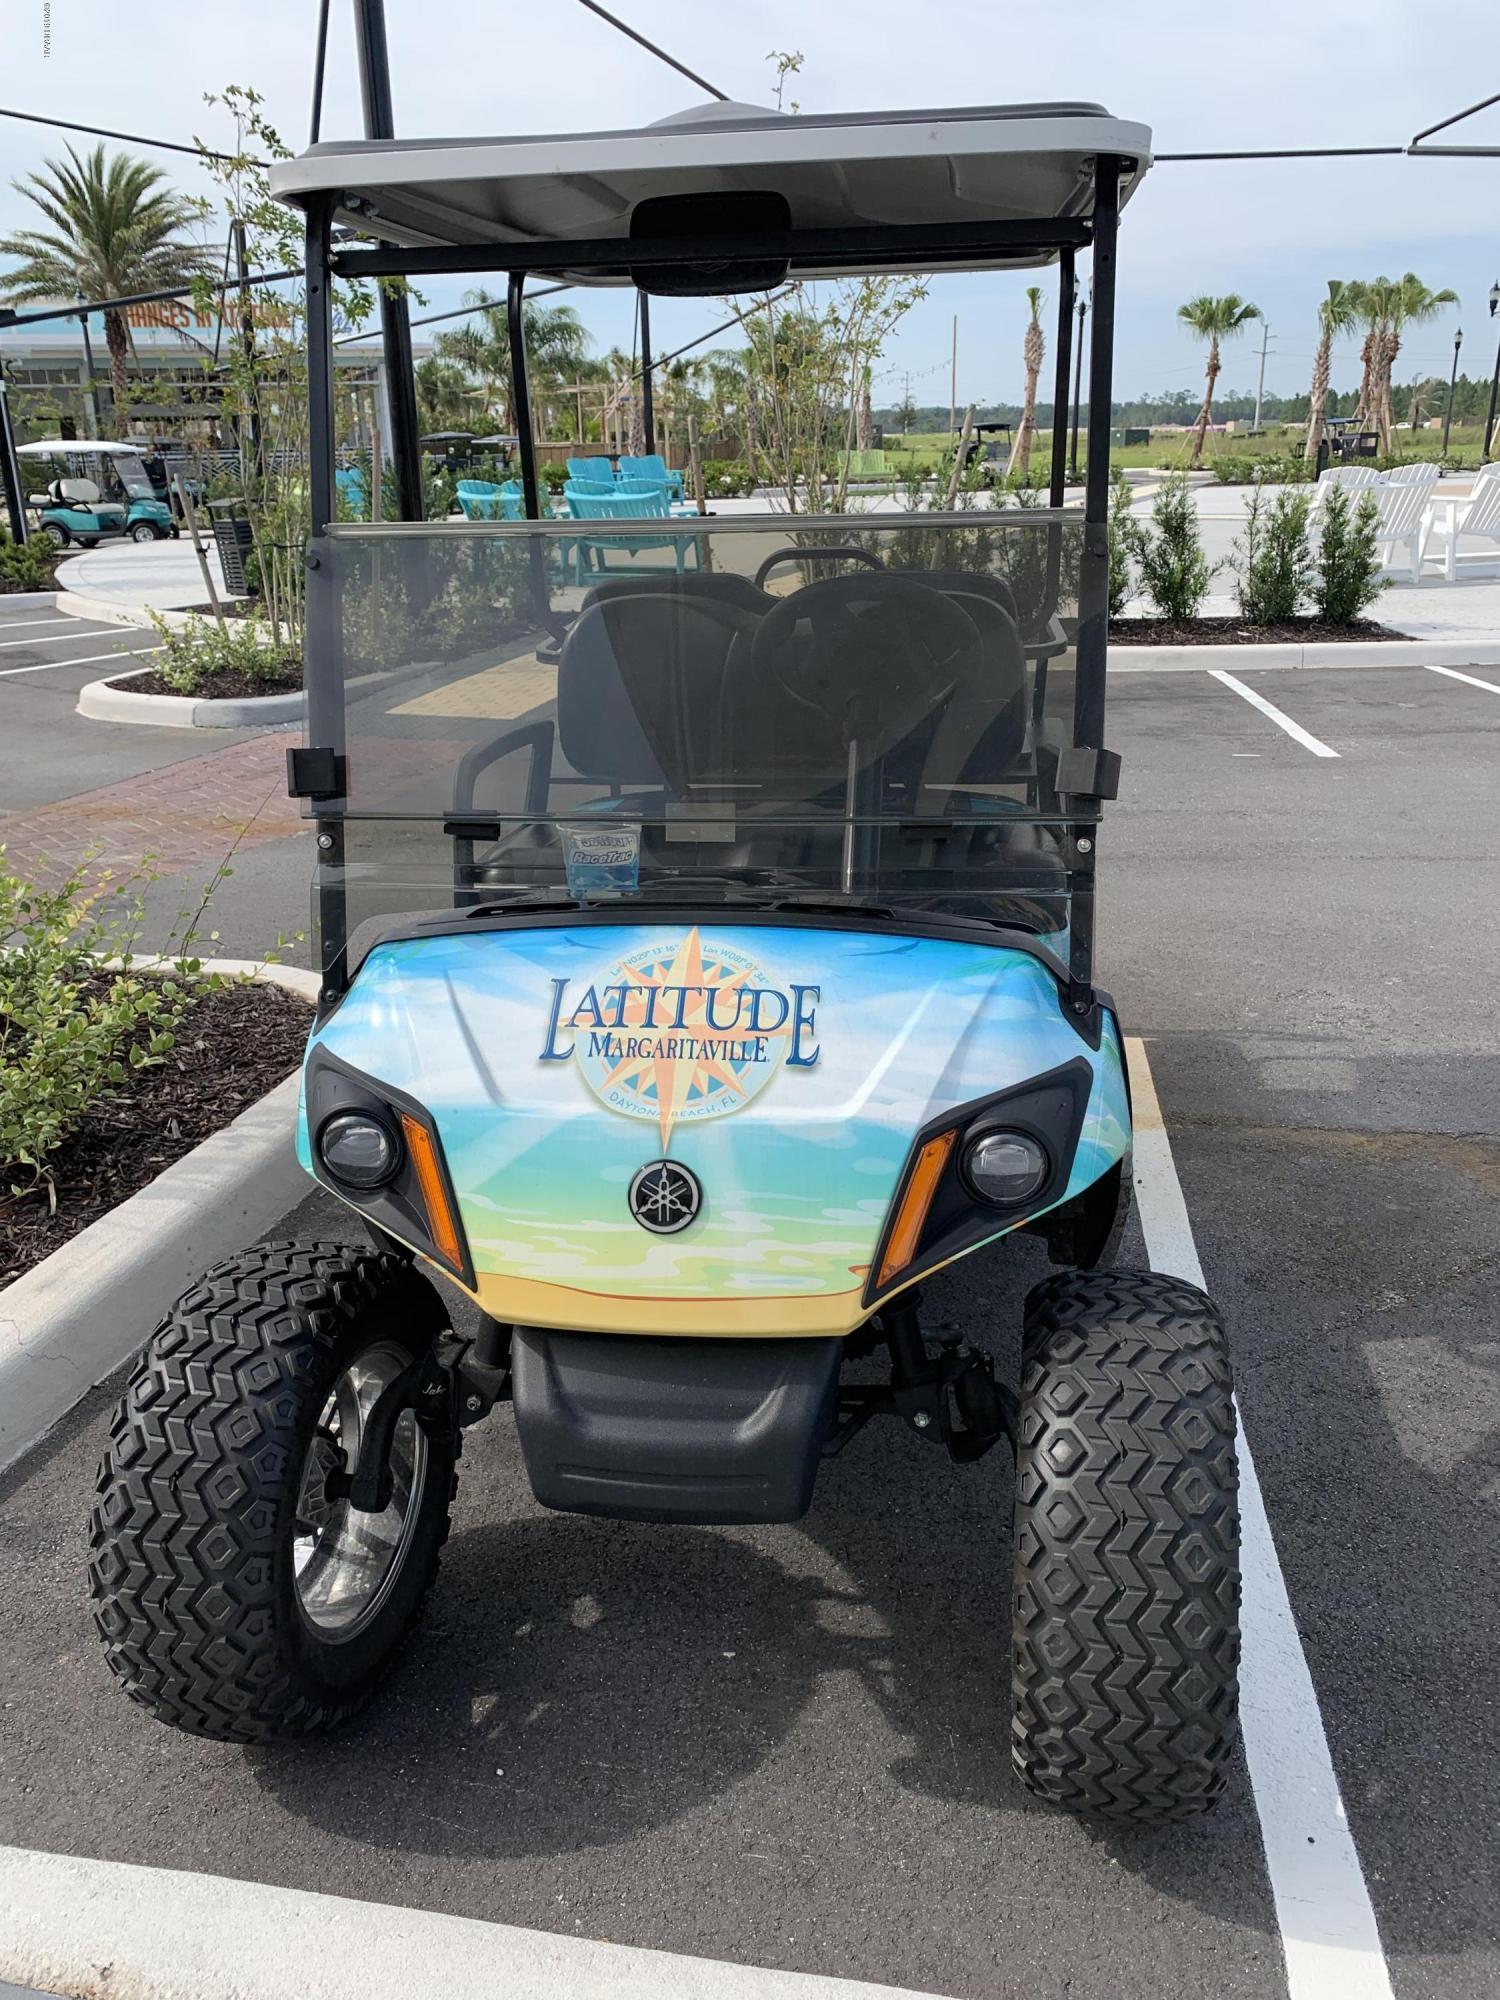 890 Attitude Daytona Beach - 25